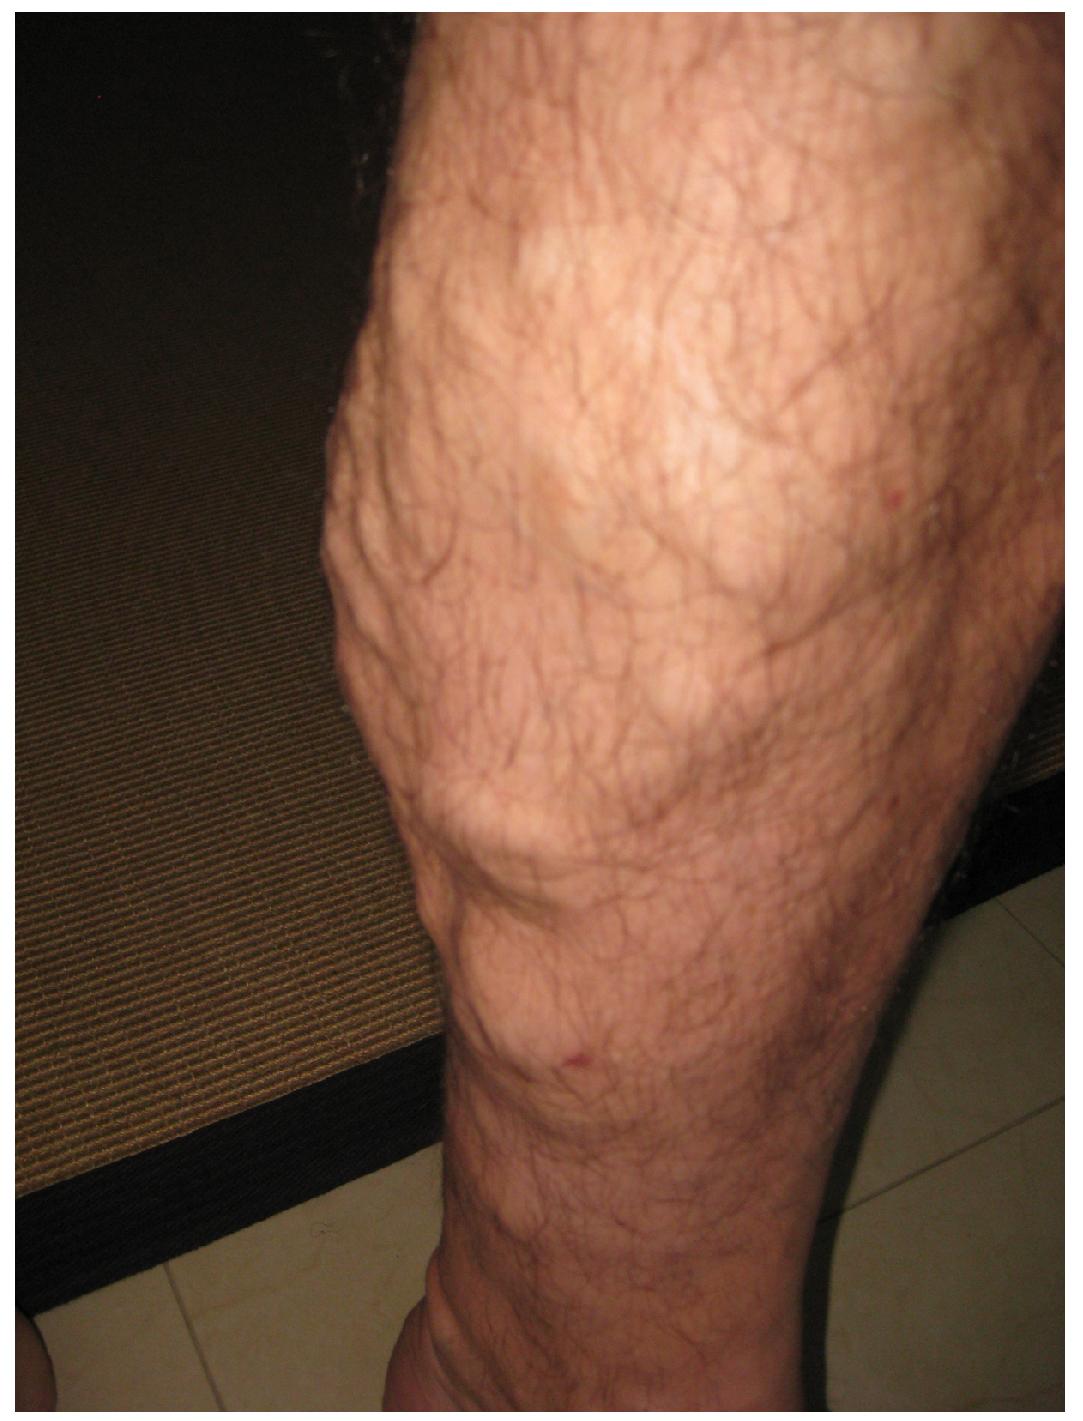 This photo shows a person's leg.